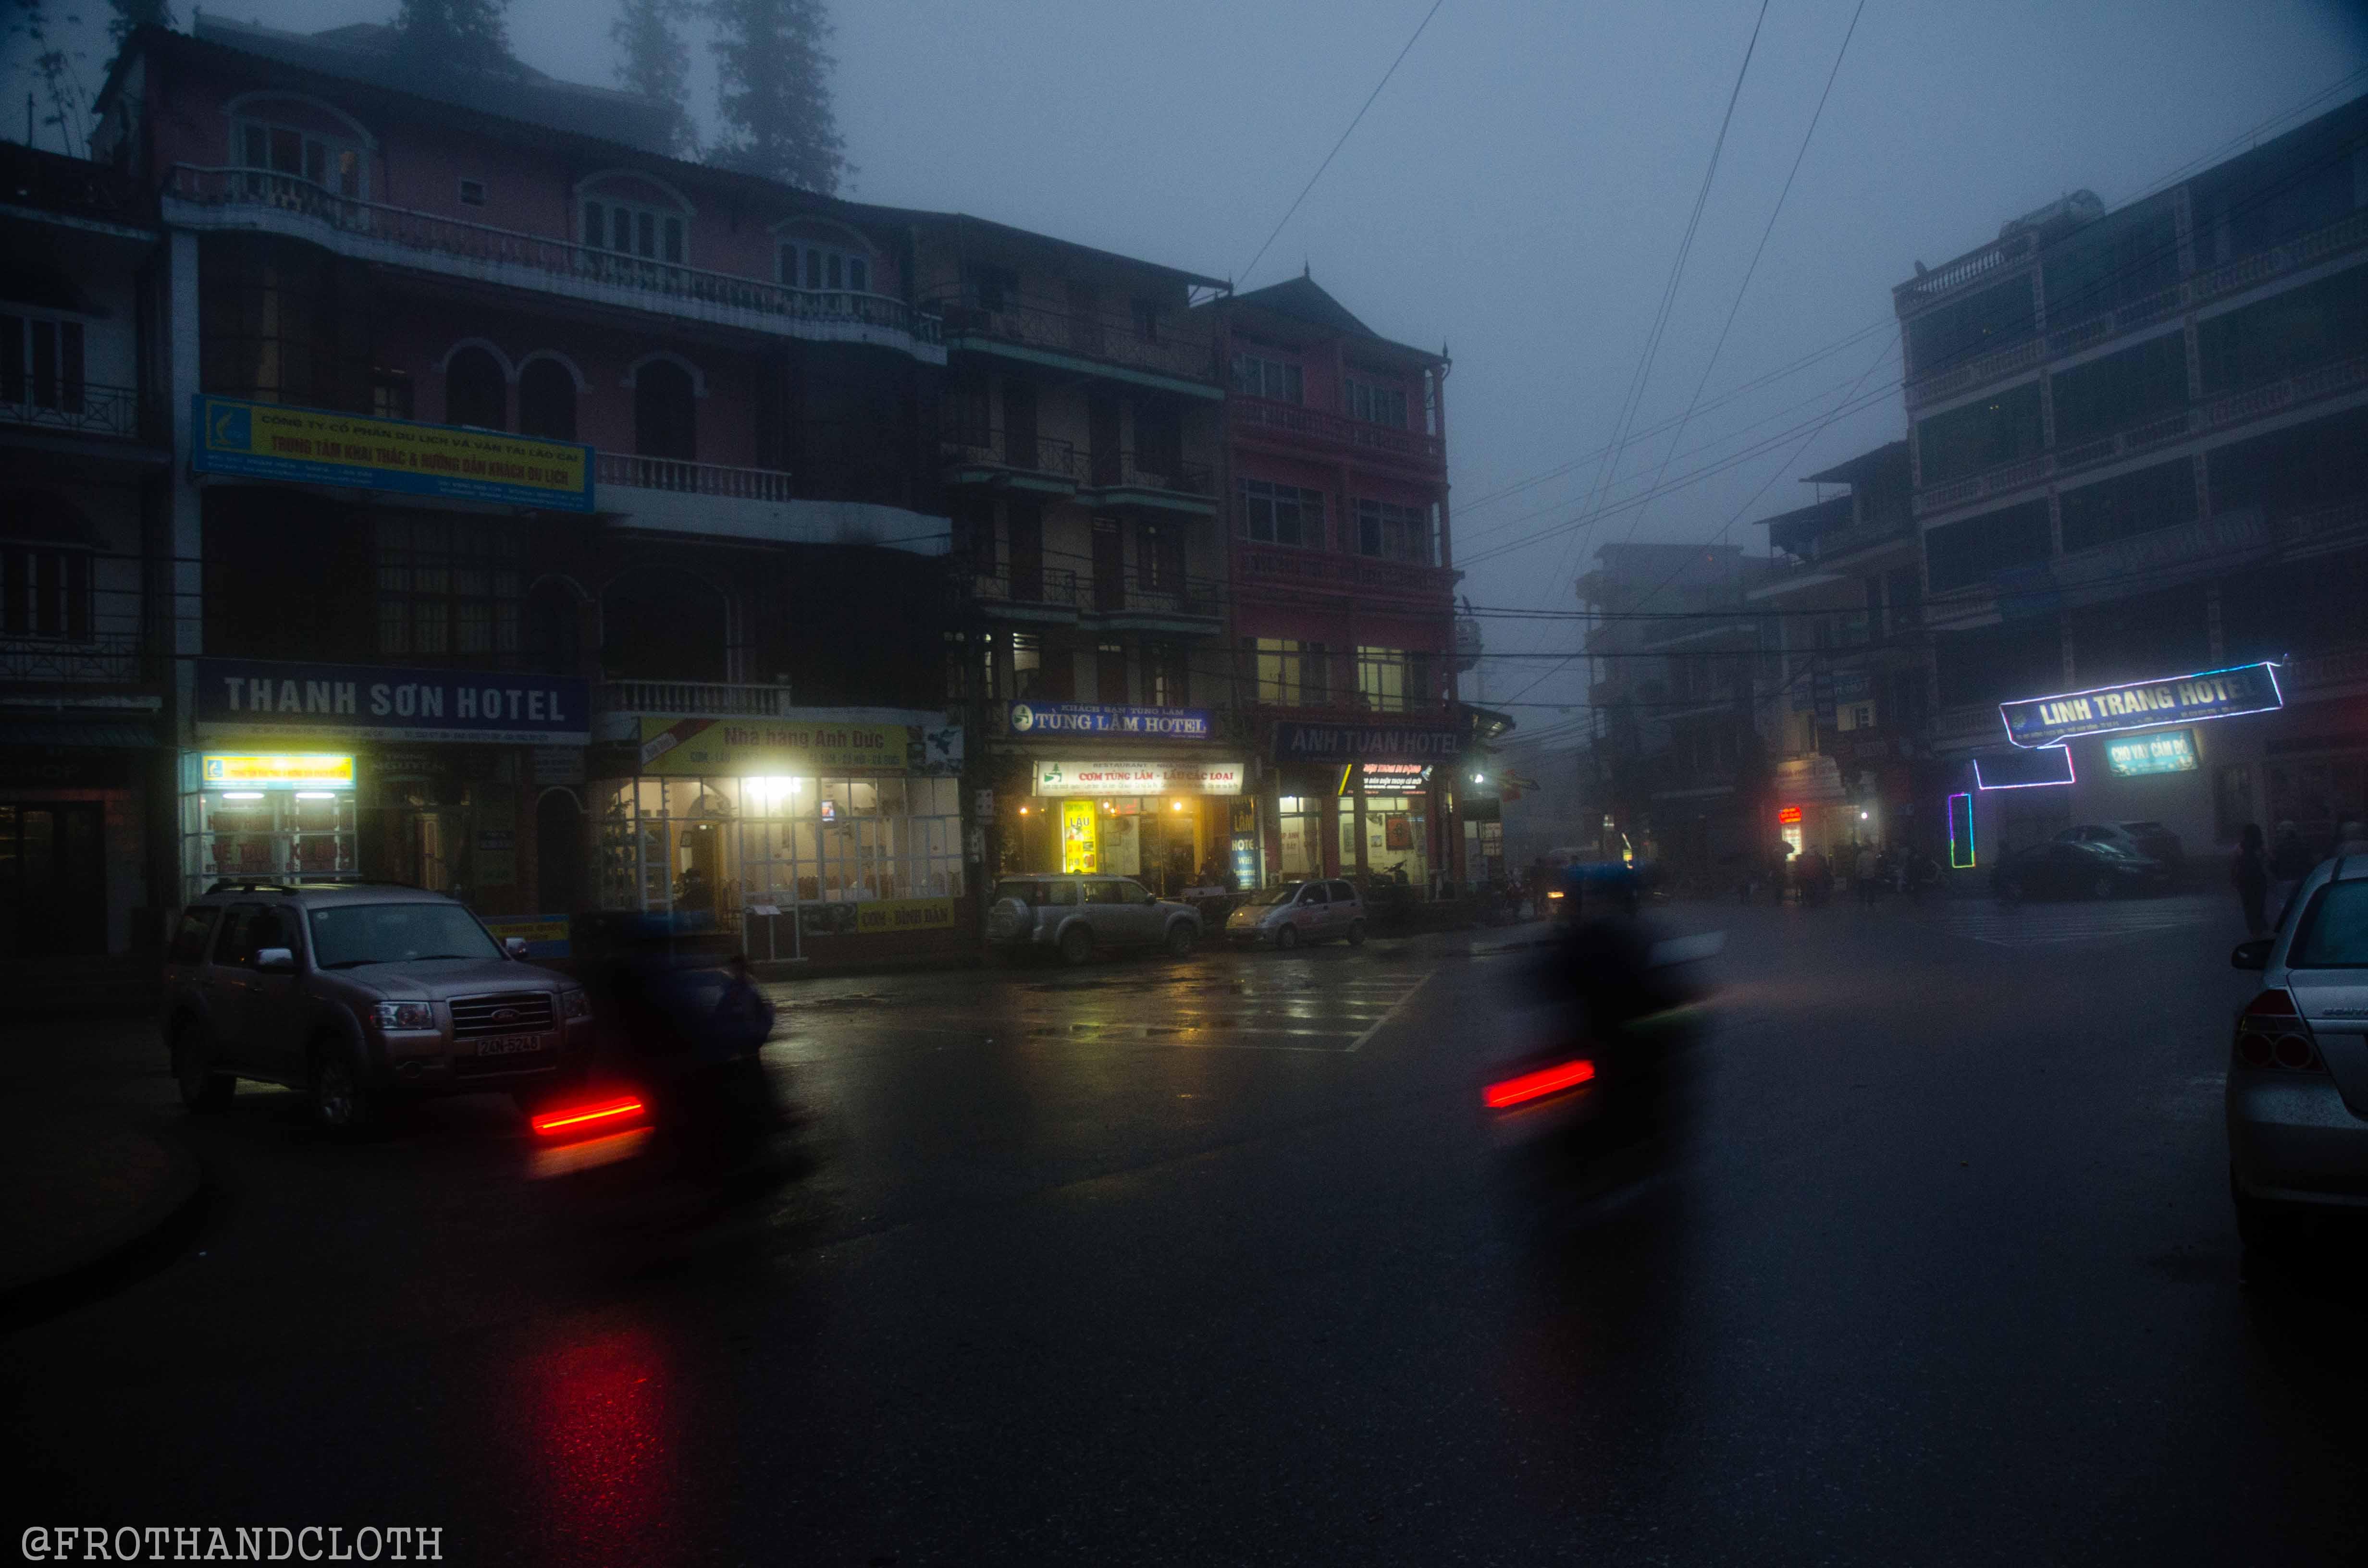 2143 - Vietnam - December 01, 2012